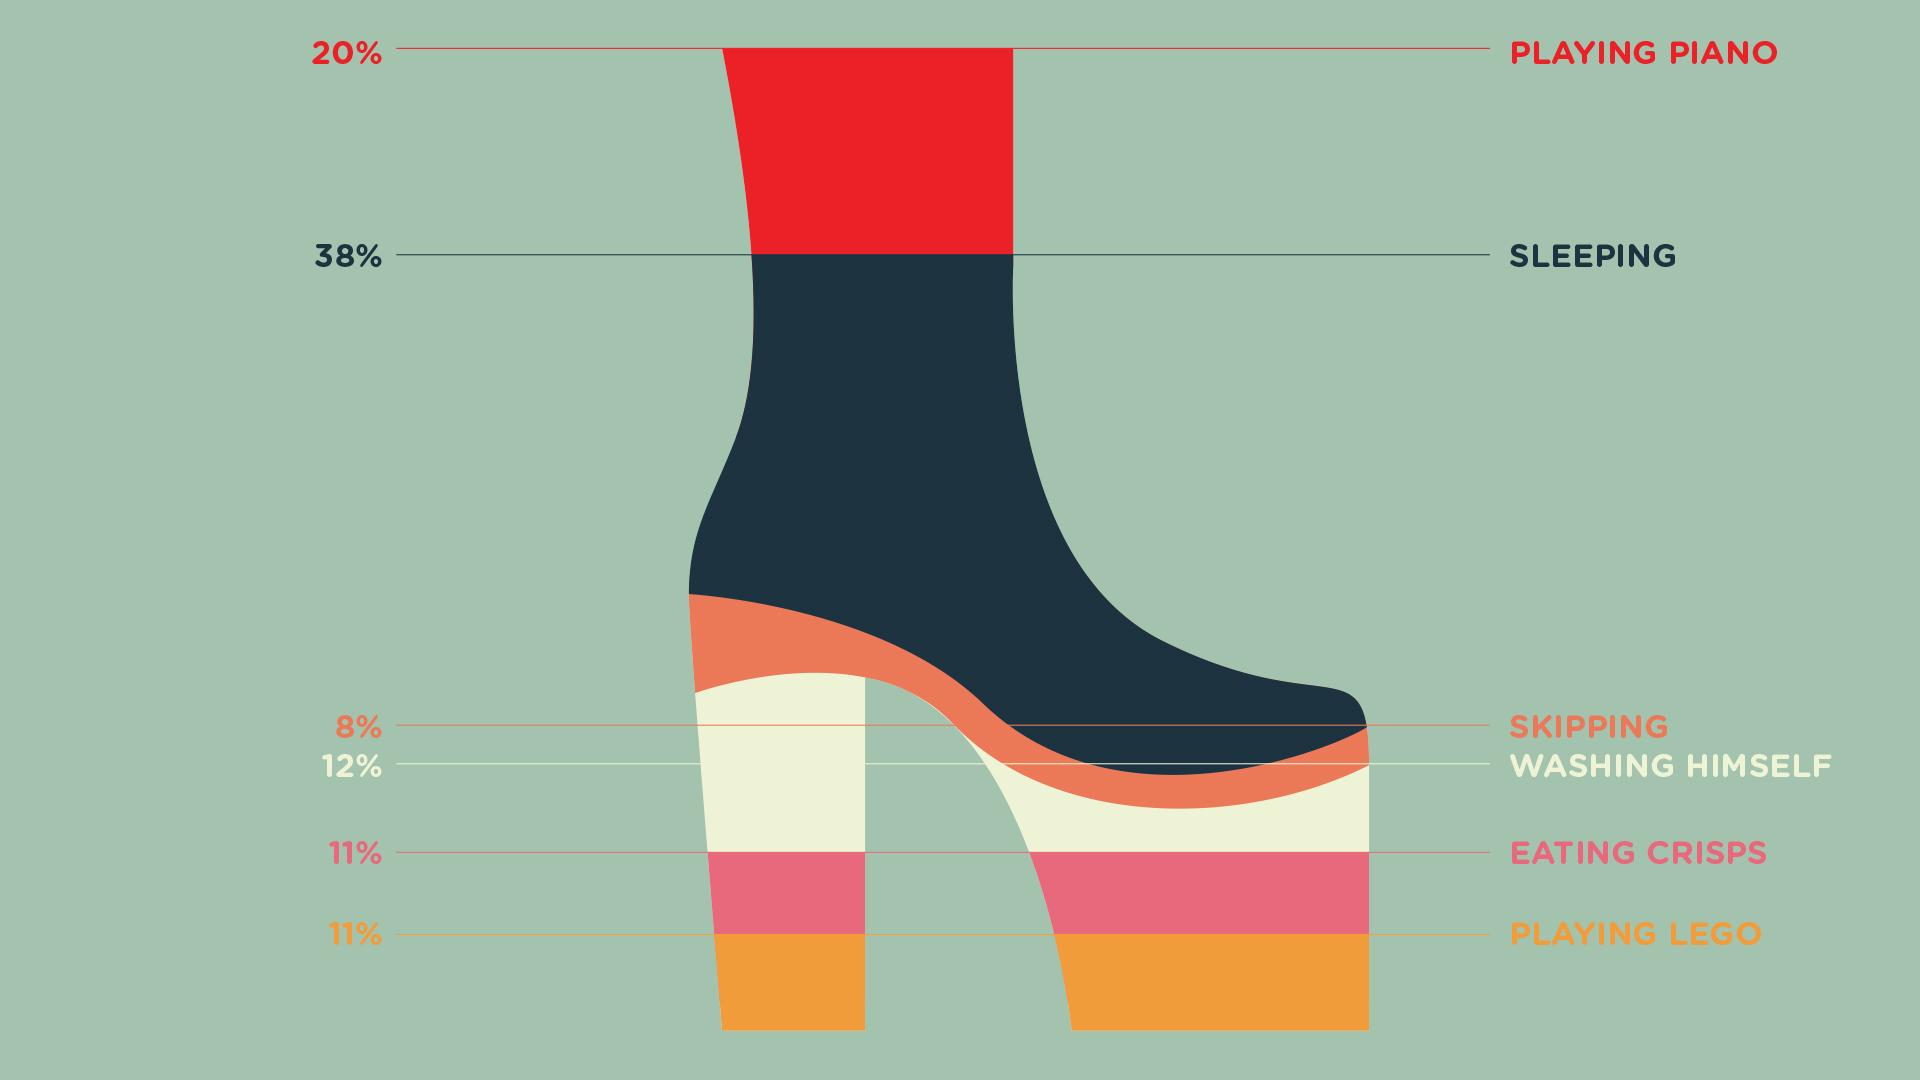 IDKT-about-Elton-John---Young-Illustration-&-Animation-Studio-Manchester-2D,-MOTION-GRAPHICS,-INFOGRAPHICS,elton,sshoes,-platform-boots,-piano,-sleeping,-skipping,-washing,-crisps,-legop,-graph,-shares.jpg